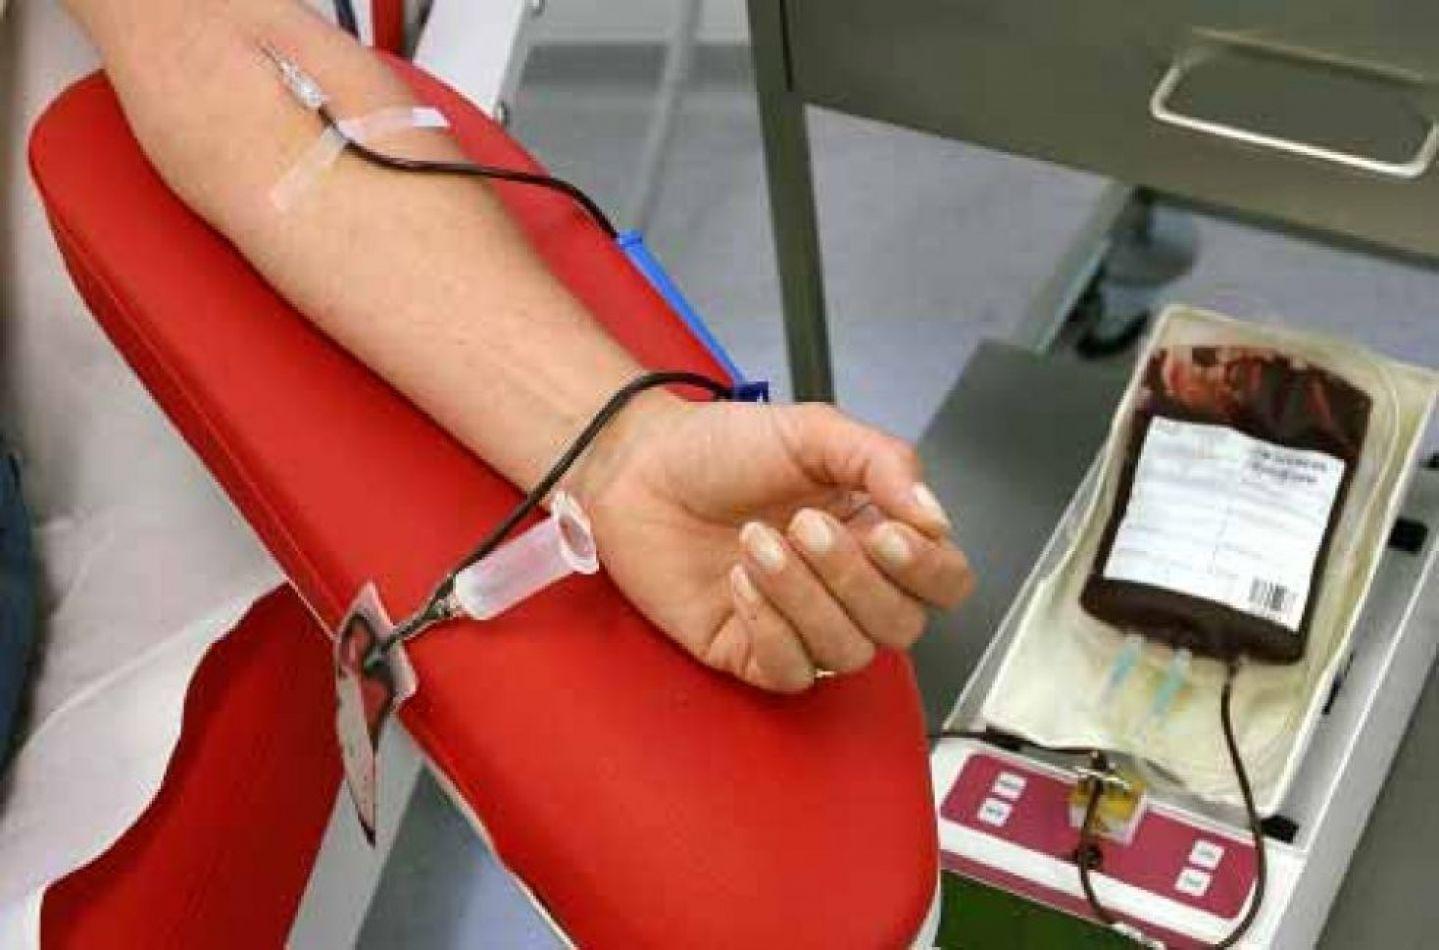 48388-piden-a-la-comunidad-donar-sangre-grupo-o-factor-rh-positivo